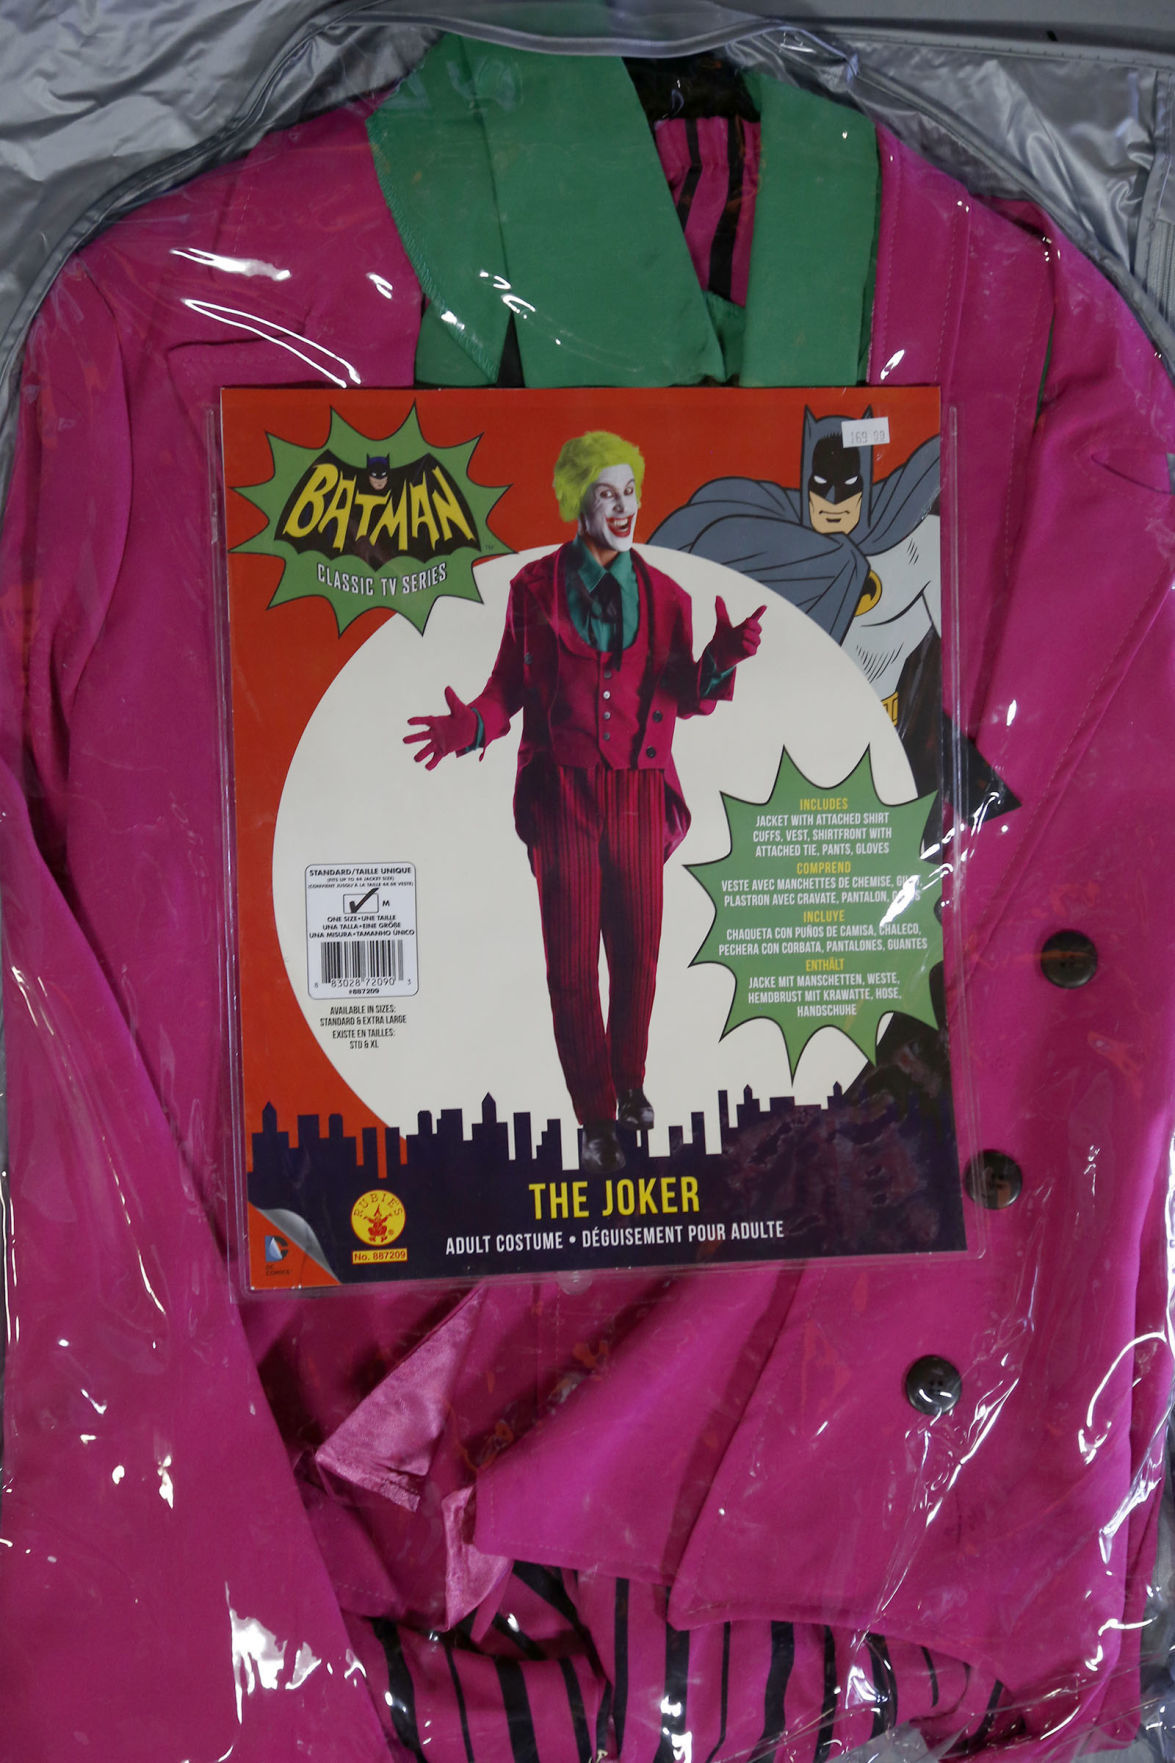 S Women/'s Mad Joker Chaqueta con chaleco y camisa, pantalones, guantes